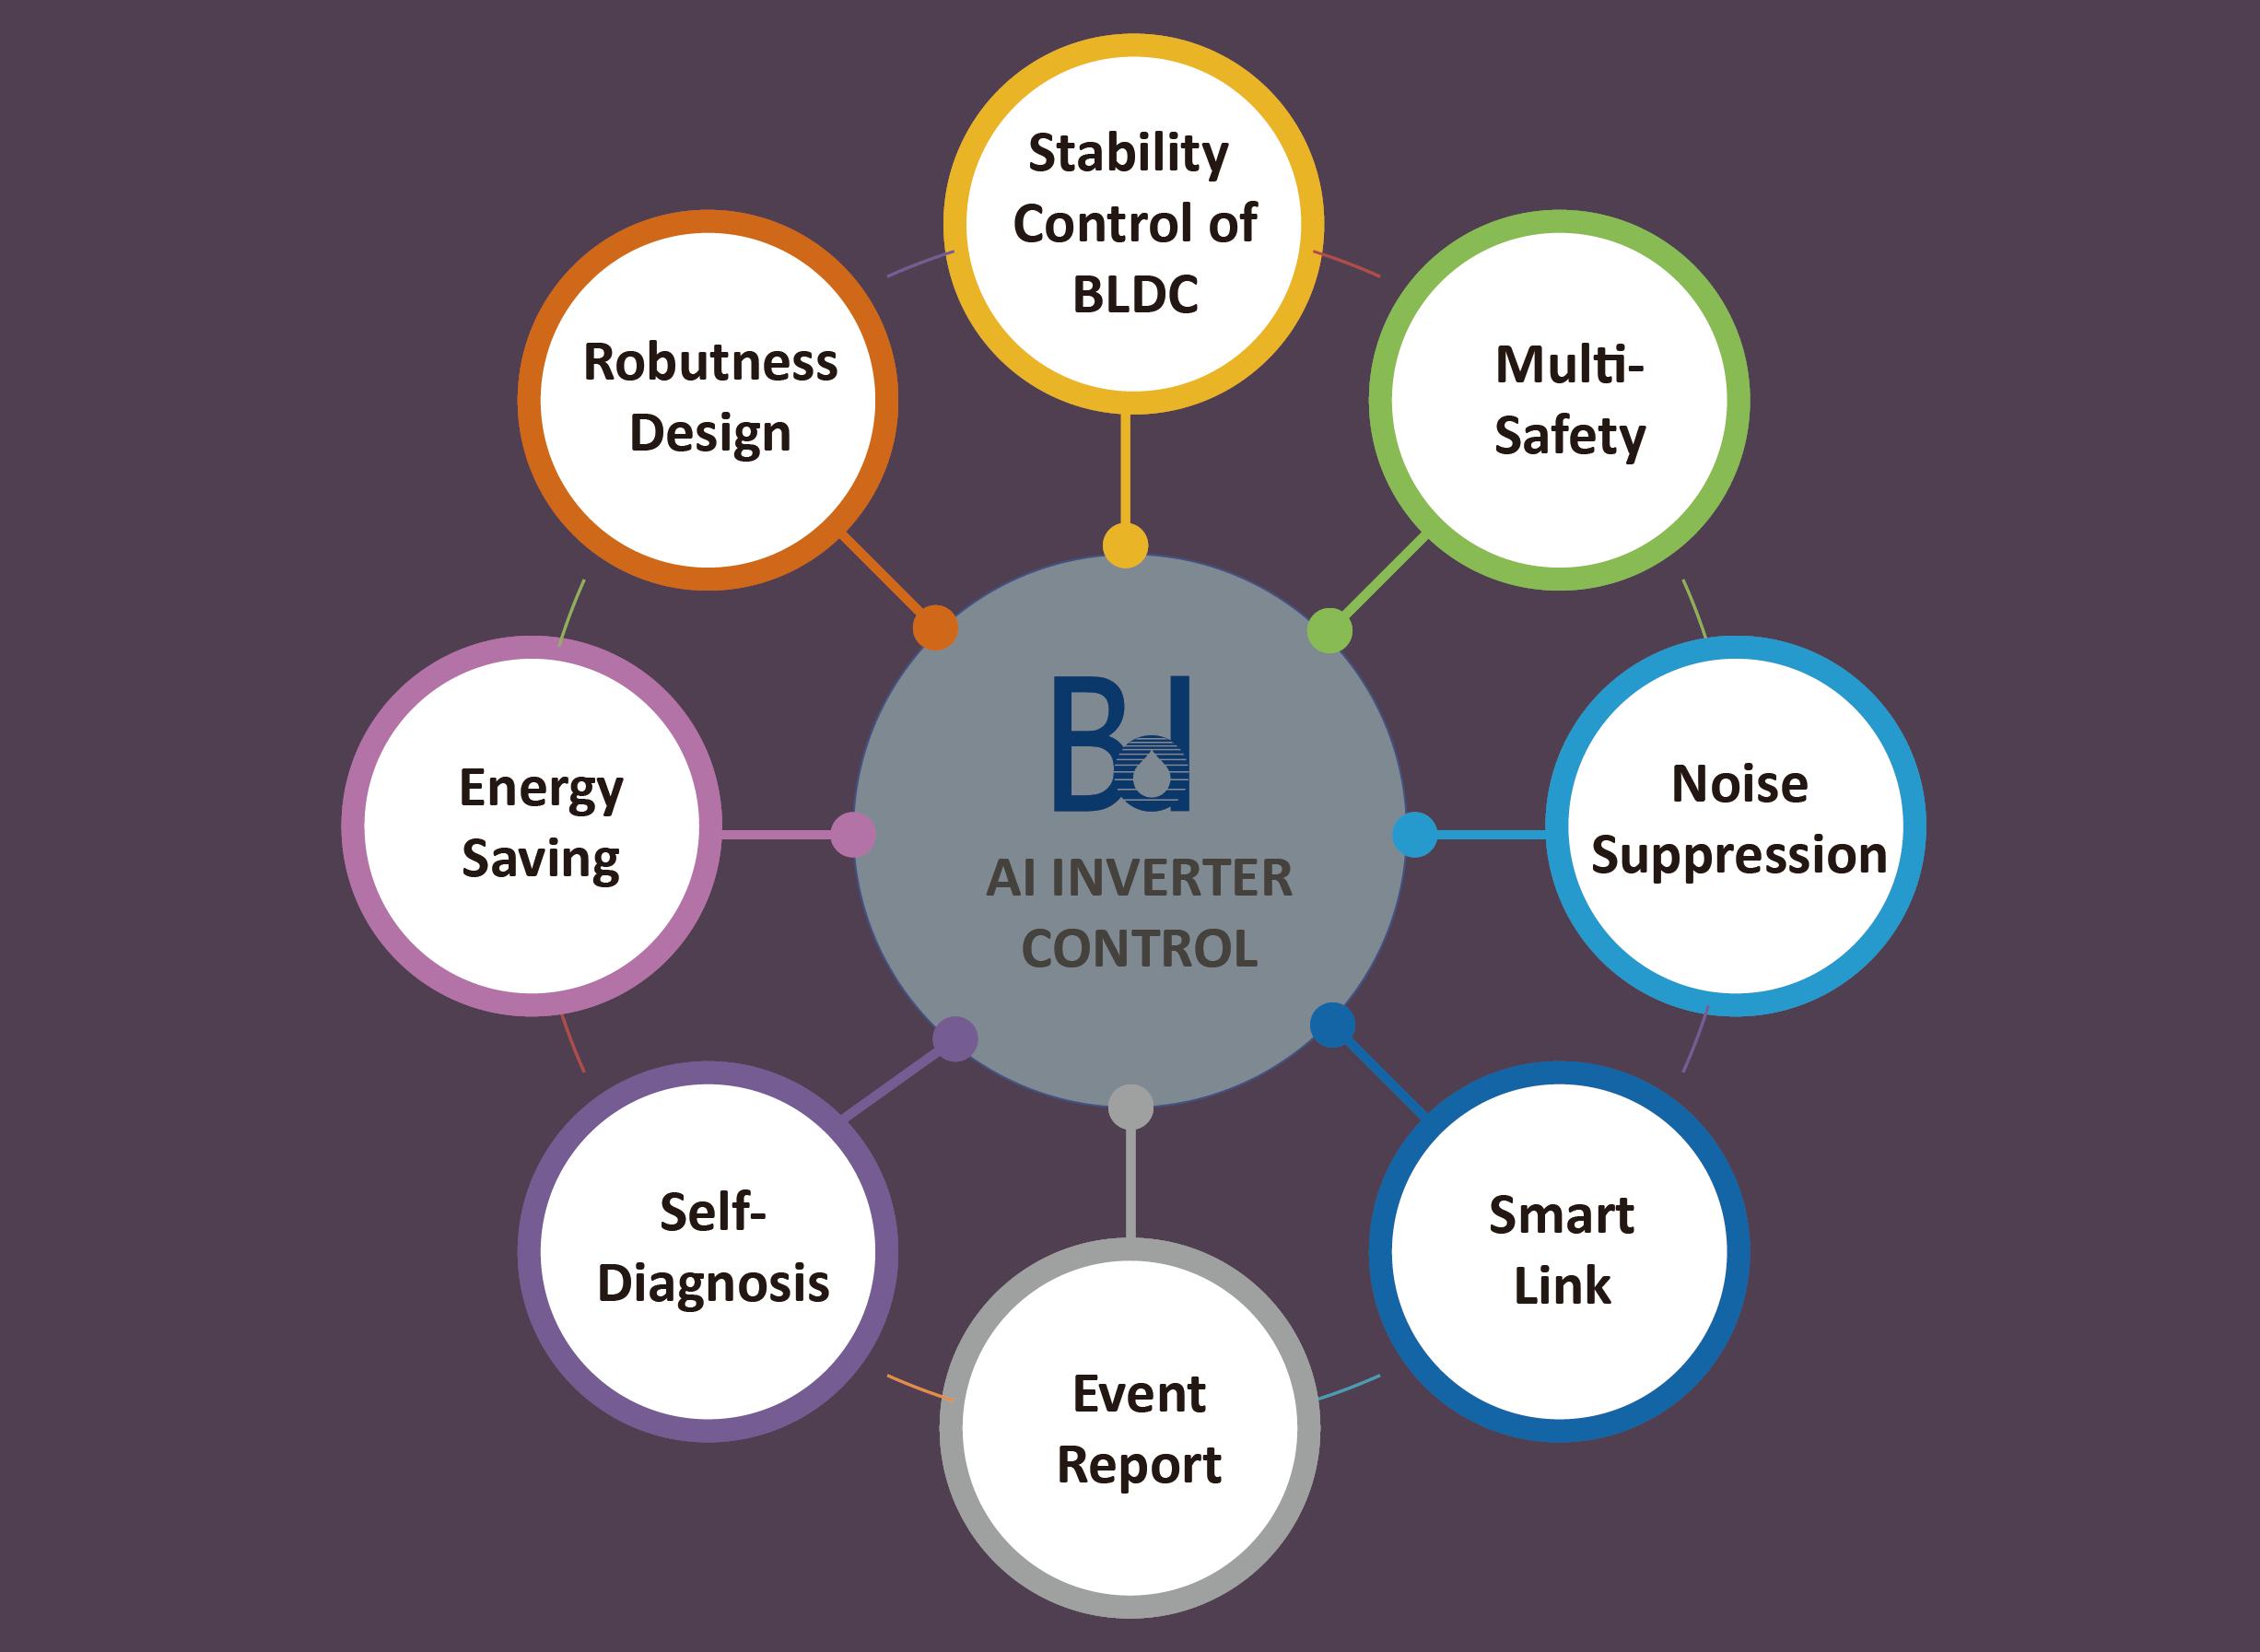 bd ai inverter technology 8 features